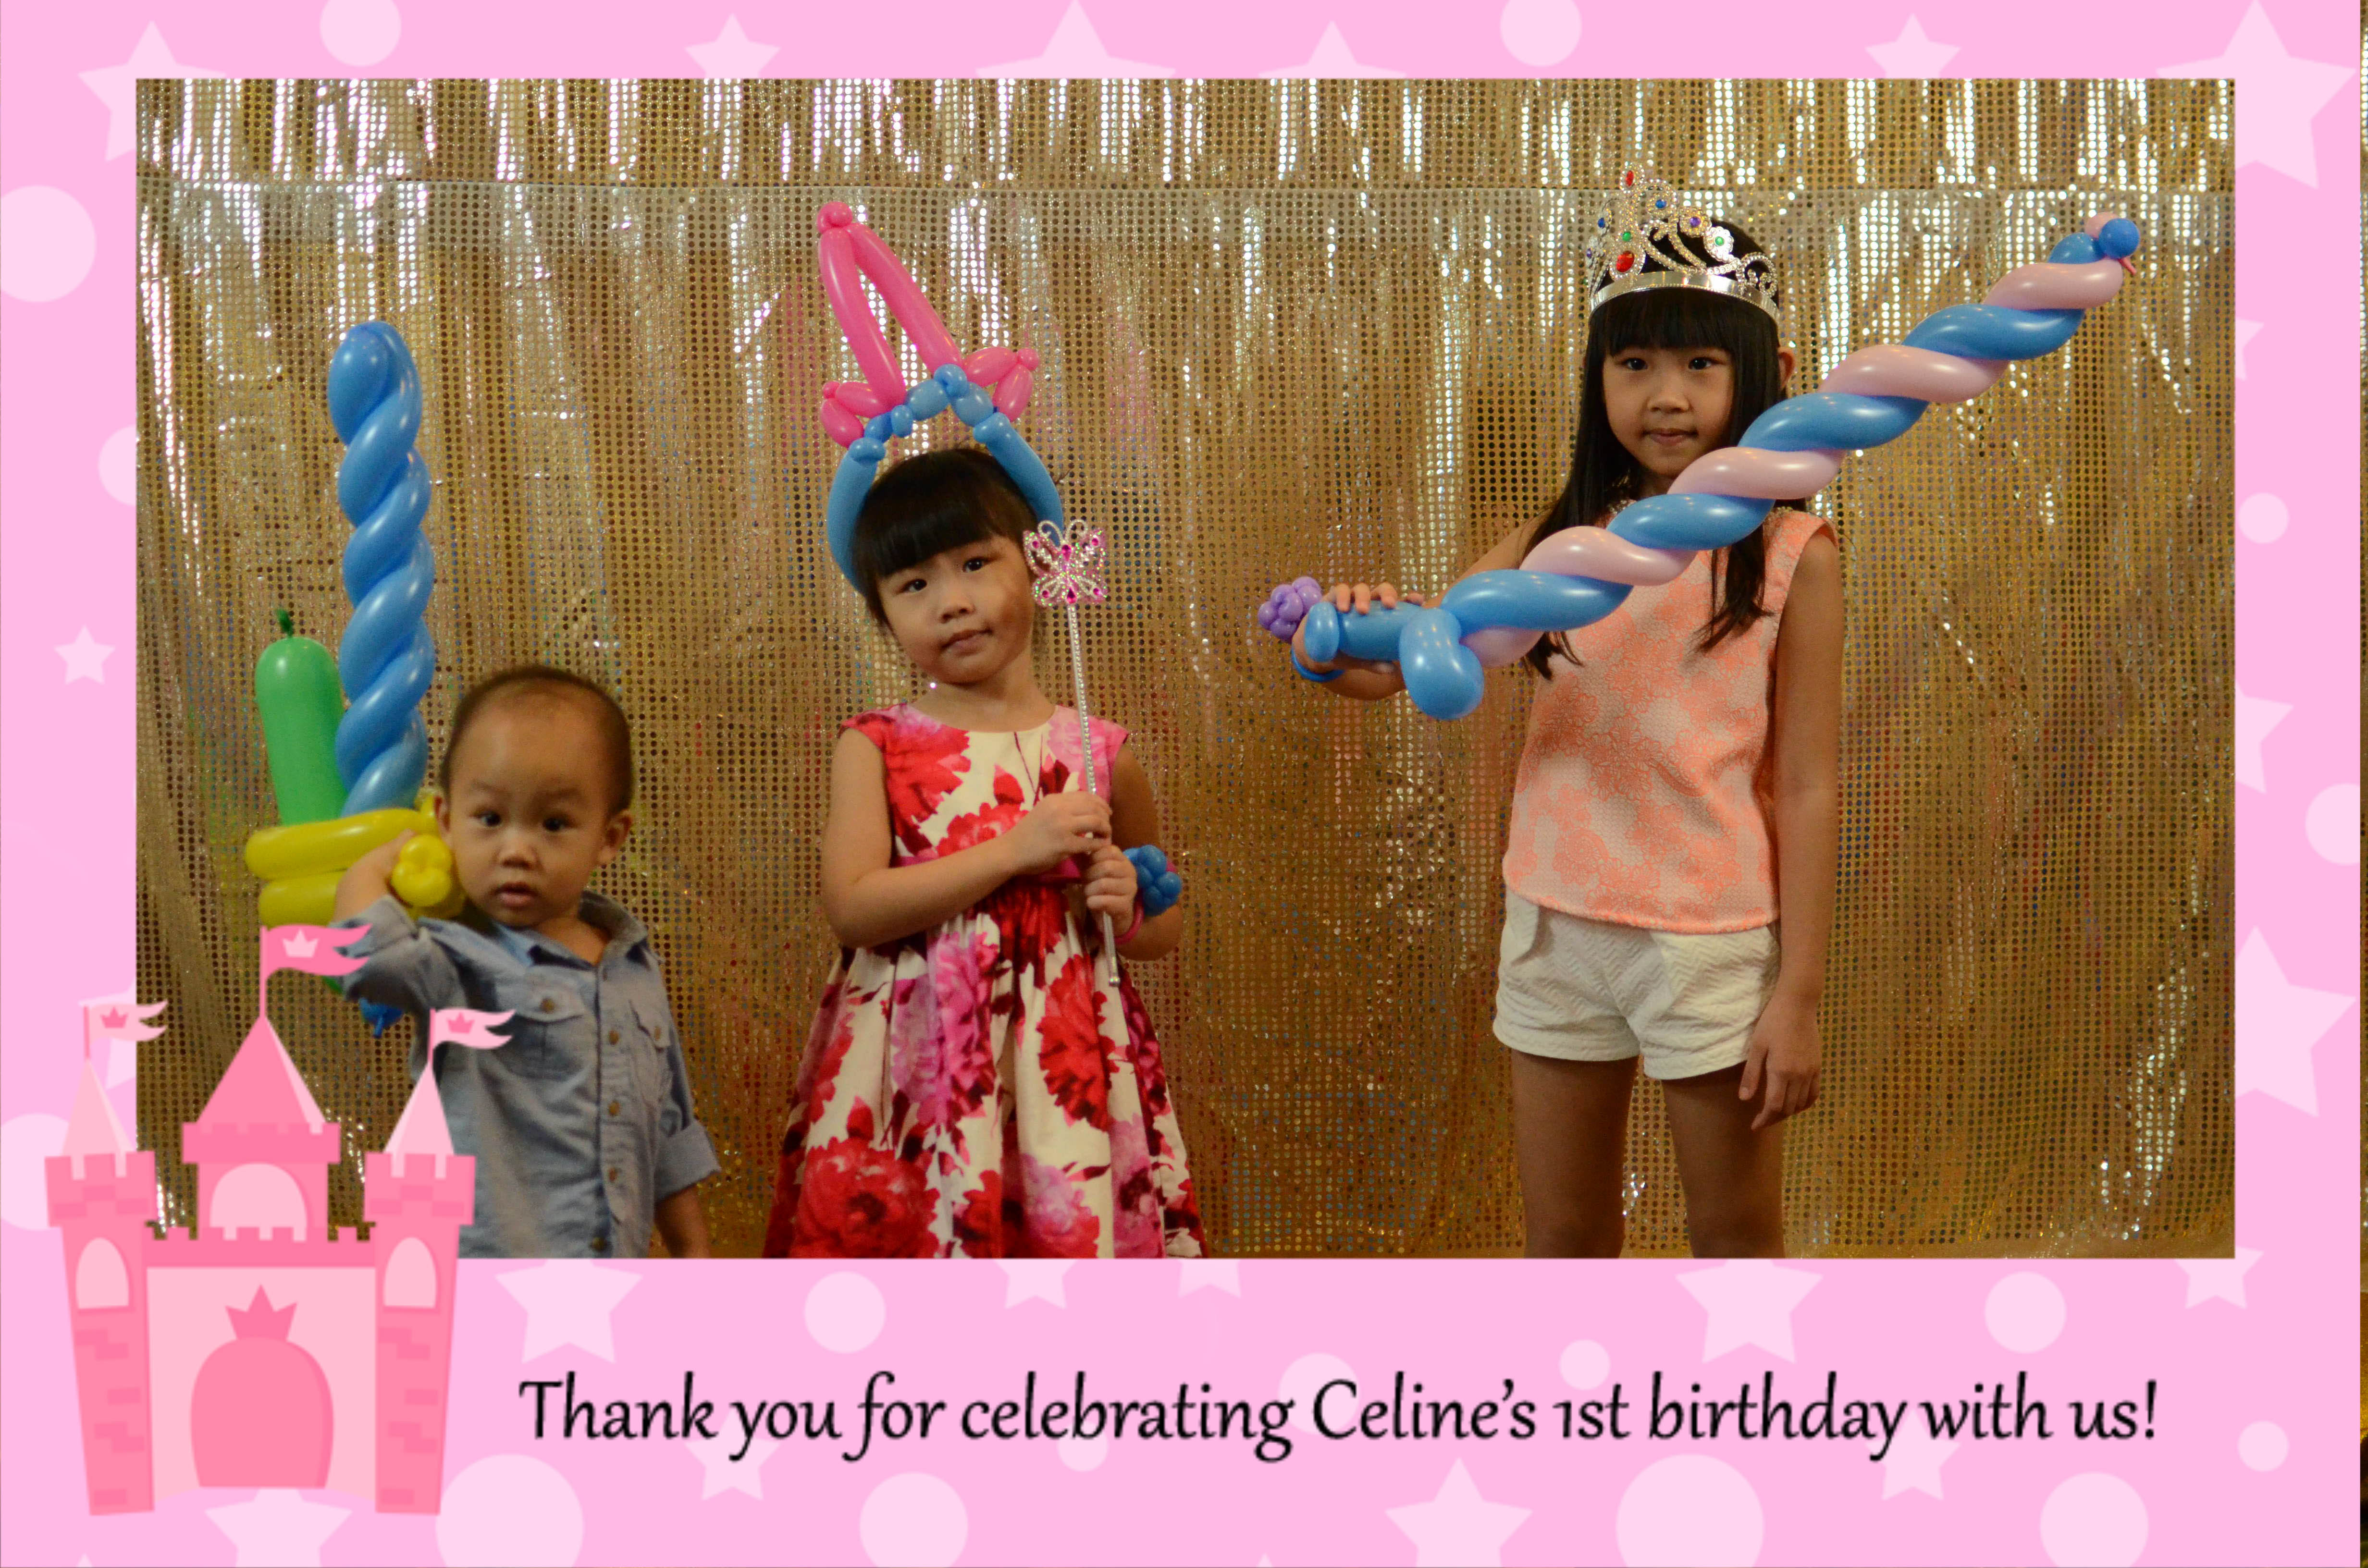 Celine-61.jpg